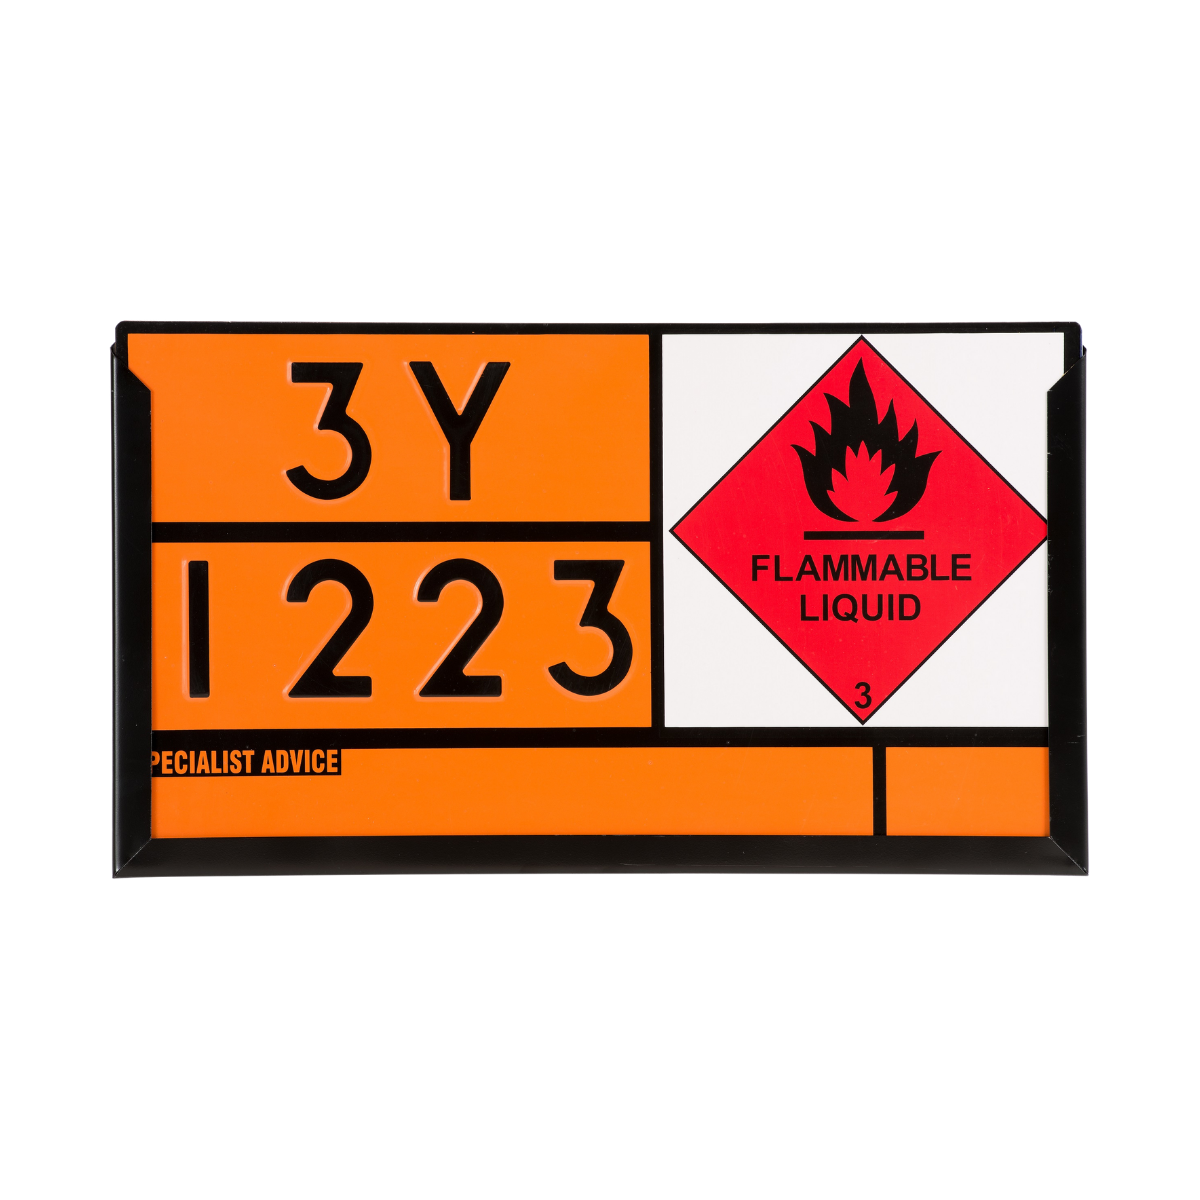 VS0100_Hazchem ADR Placard Panel Holder 700 x 400mm